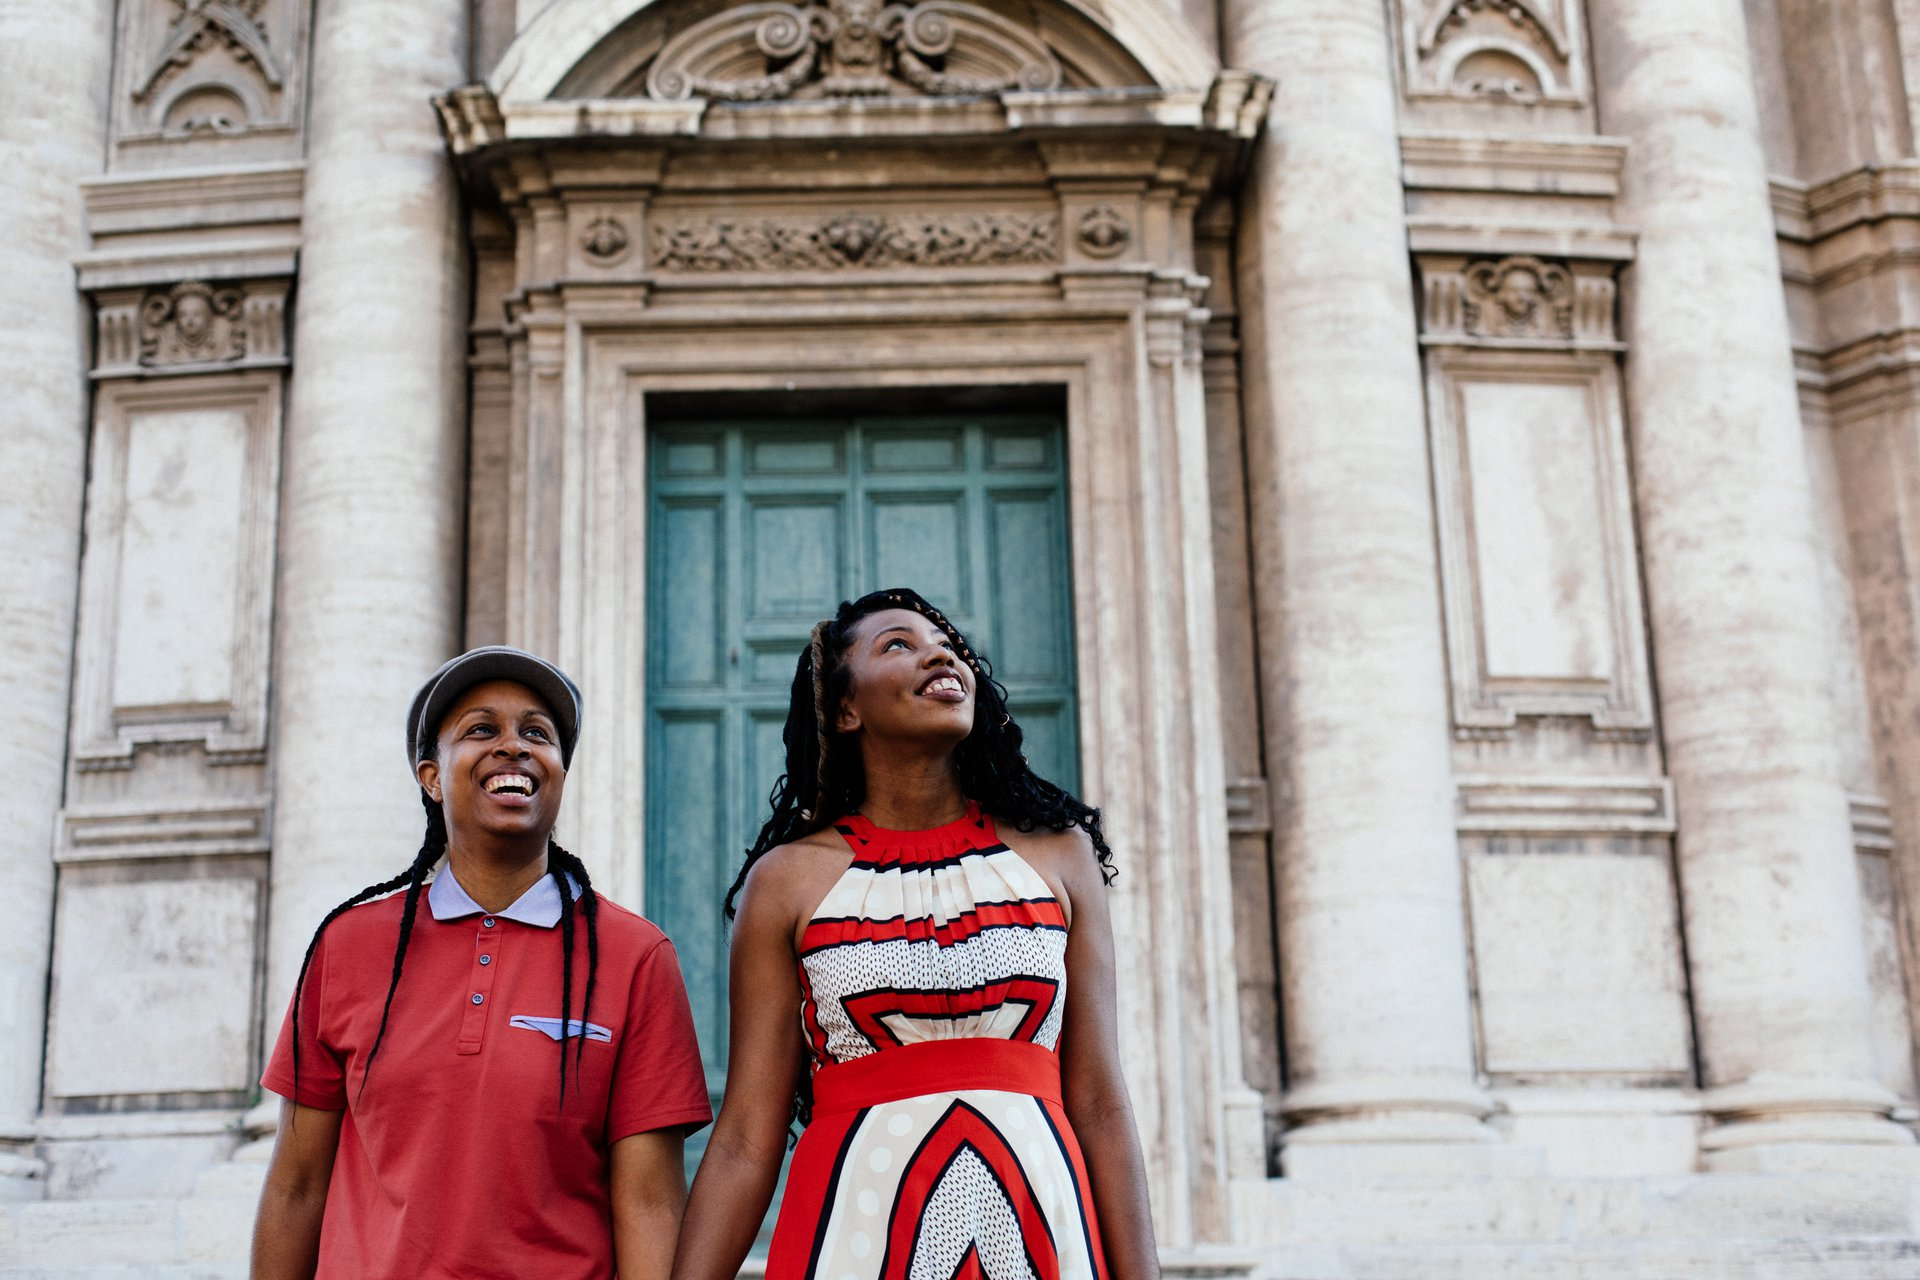 Rome-Italy-travel-story-Flytographer-40